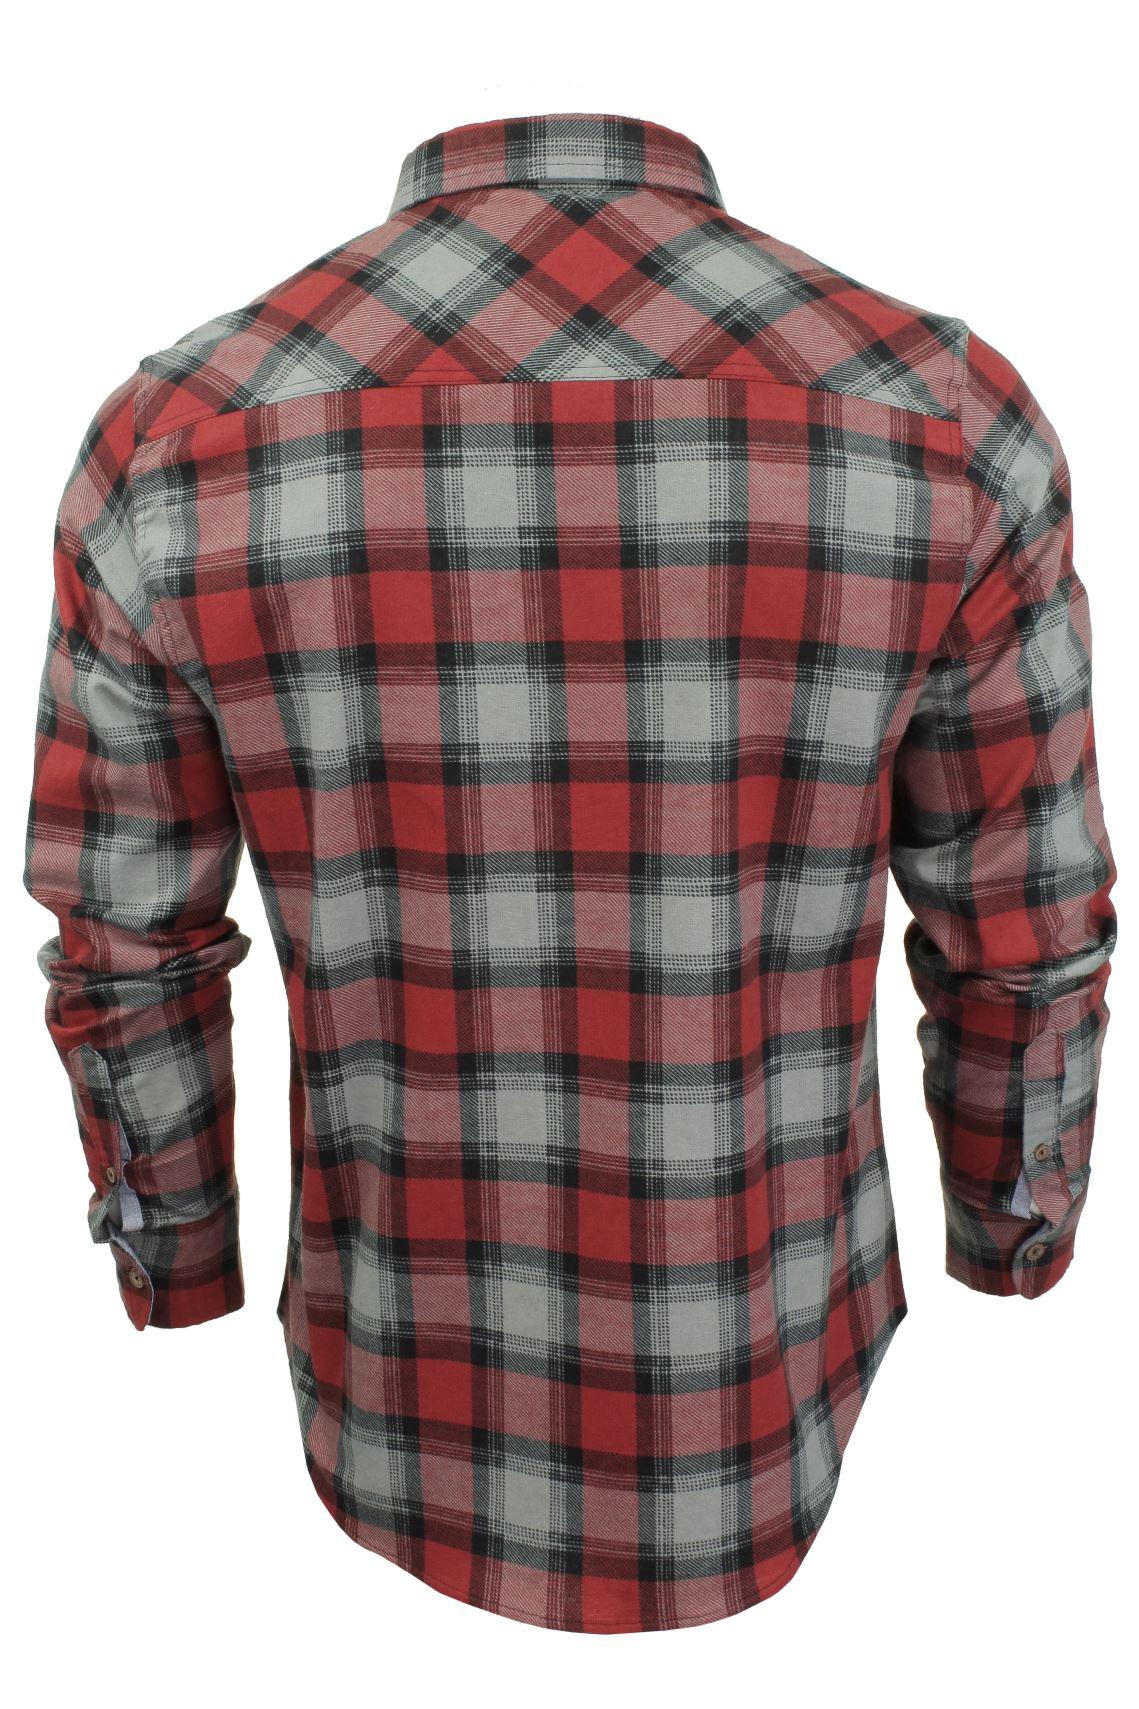 Brave-Soul-Brushed-Flannel-Check-Cotton-Jack-Shirt-Long-Sleeved thumbnail 18